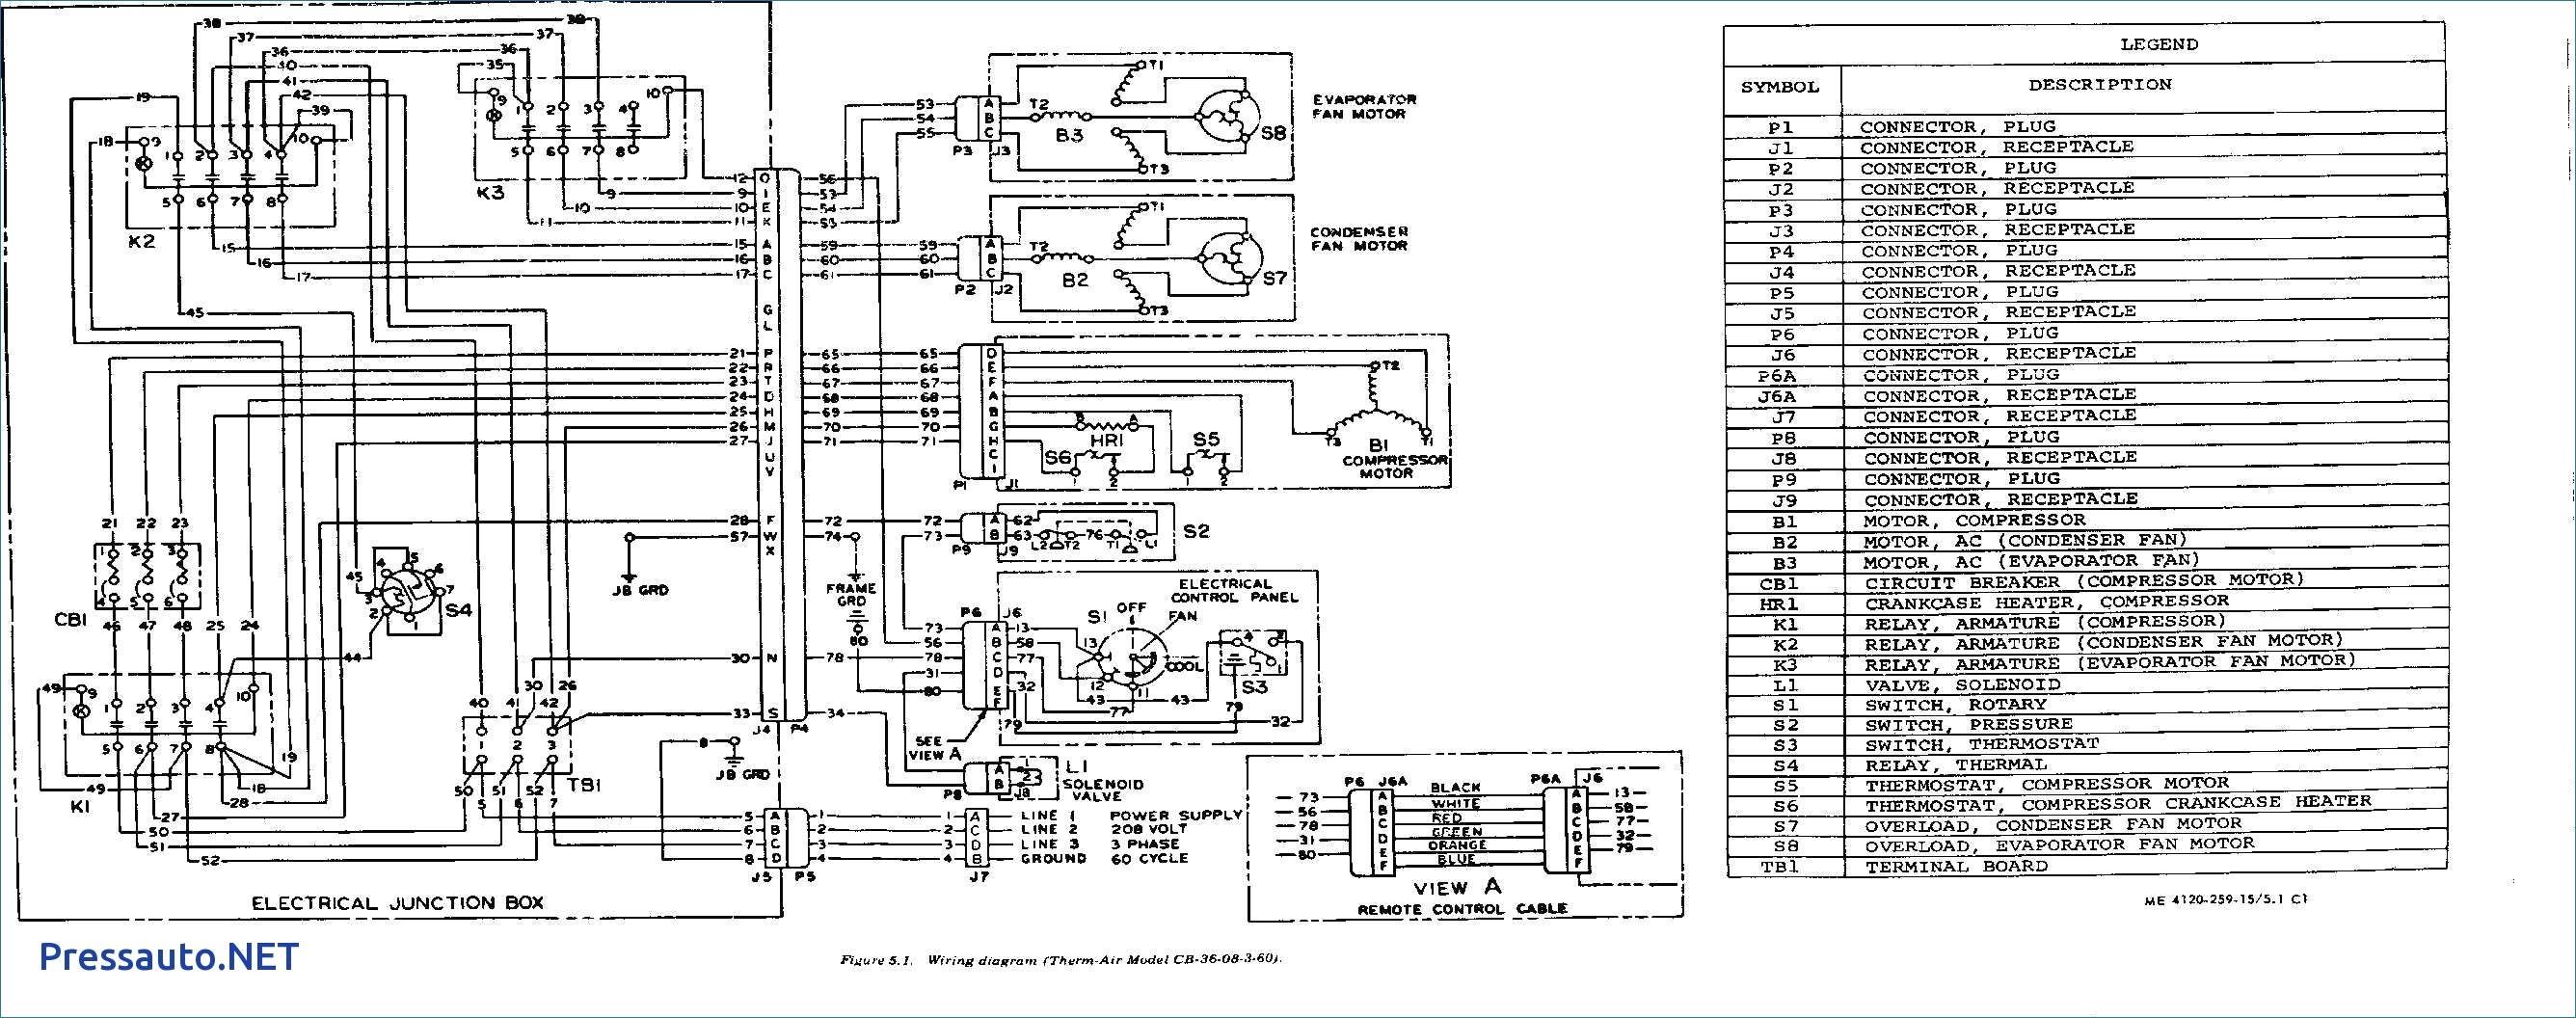 Trane Hvac Wiring Diagrams Model Twp036c100a1 wiring data